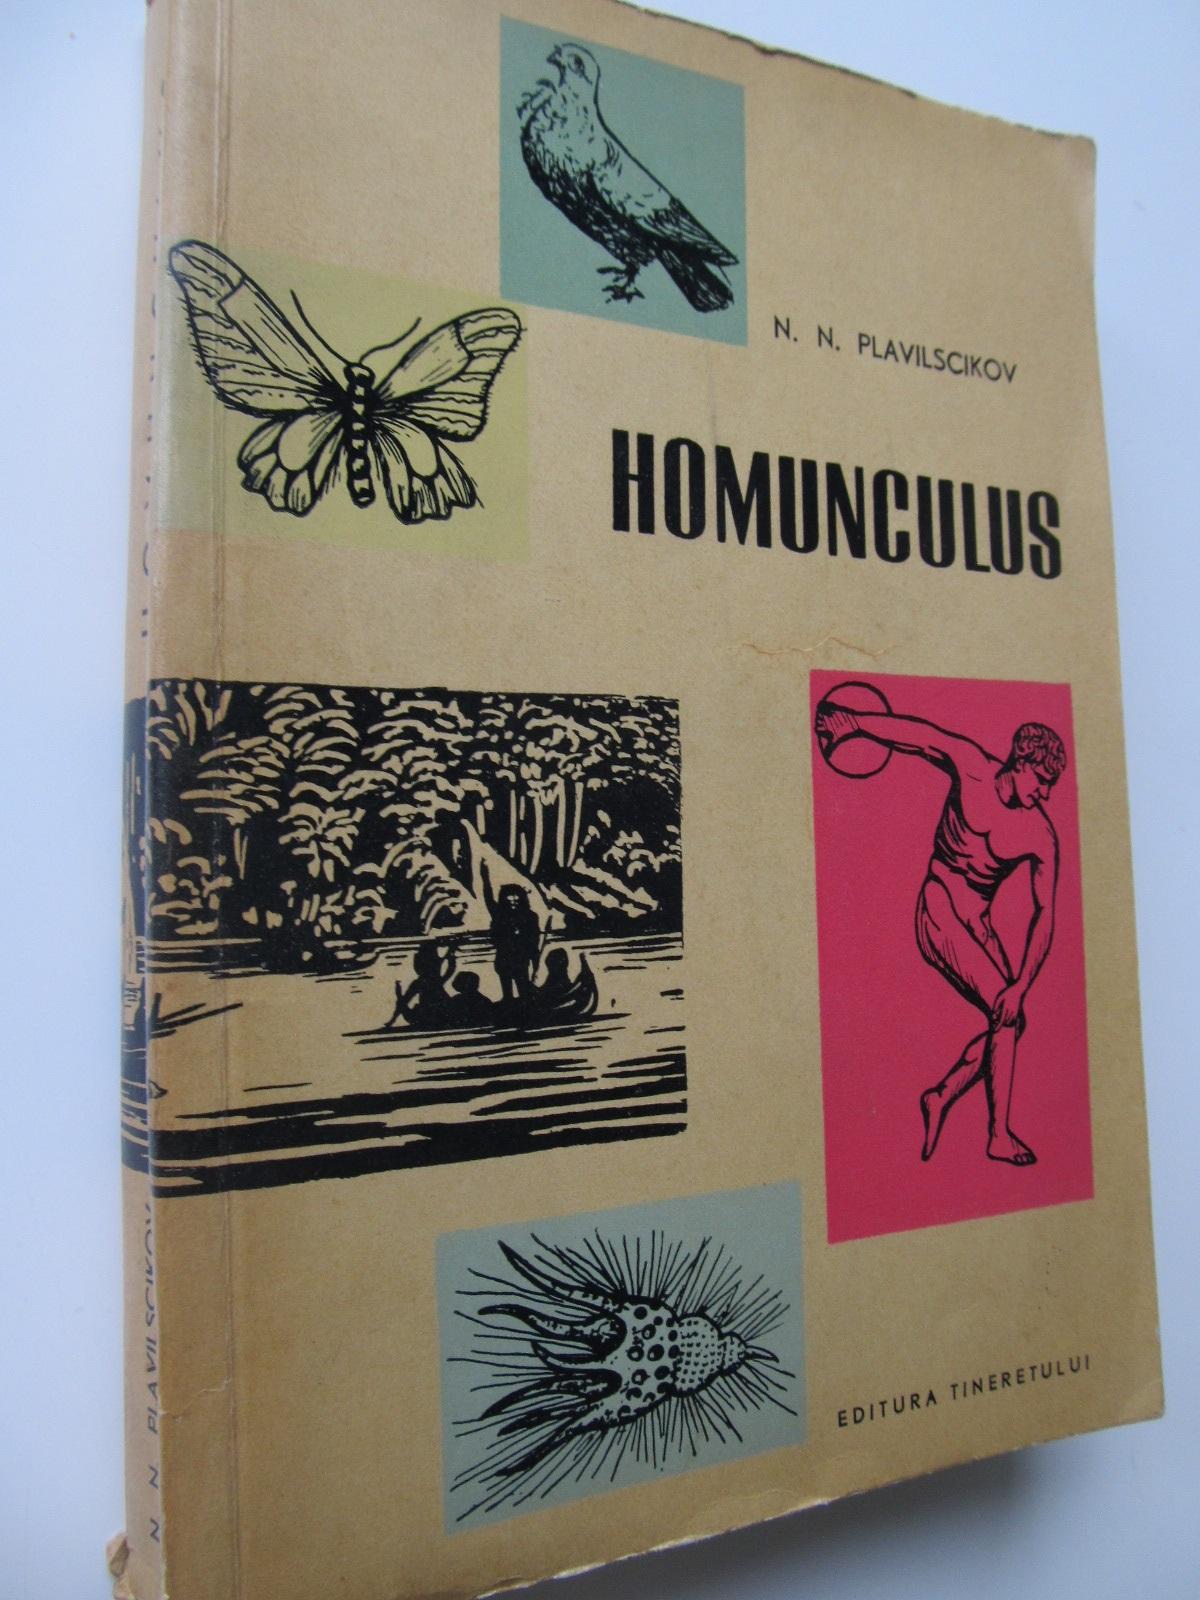 Homunculus - Schite din istoria Biologiei - N. N. Plavilscikov | Detalii carte